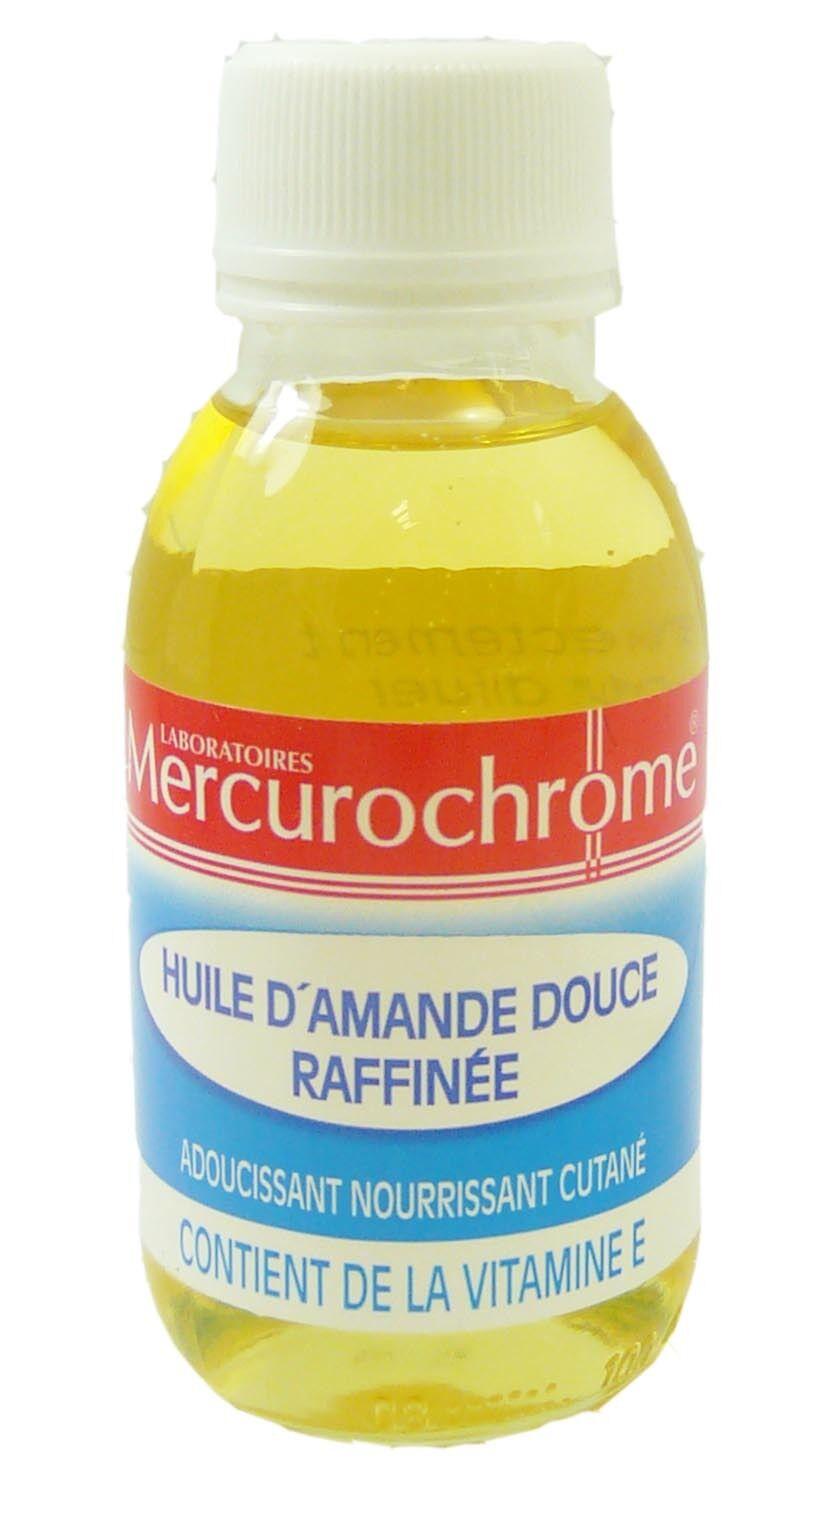 Mercurochrome huile d'amande douce raffinee 100ml